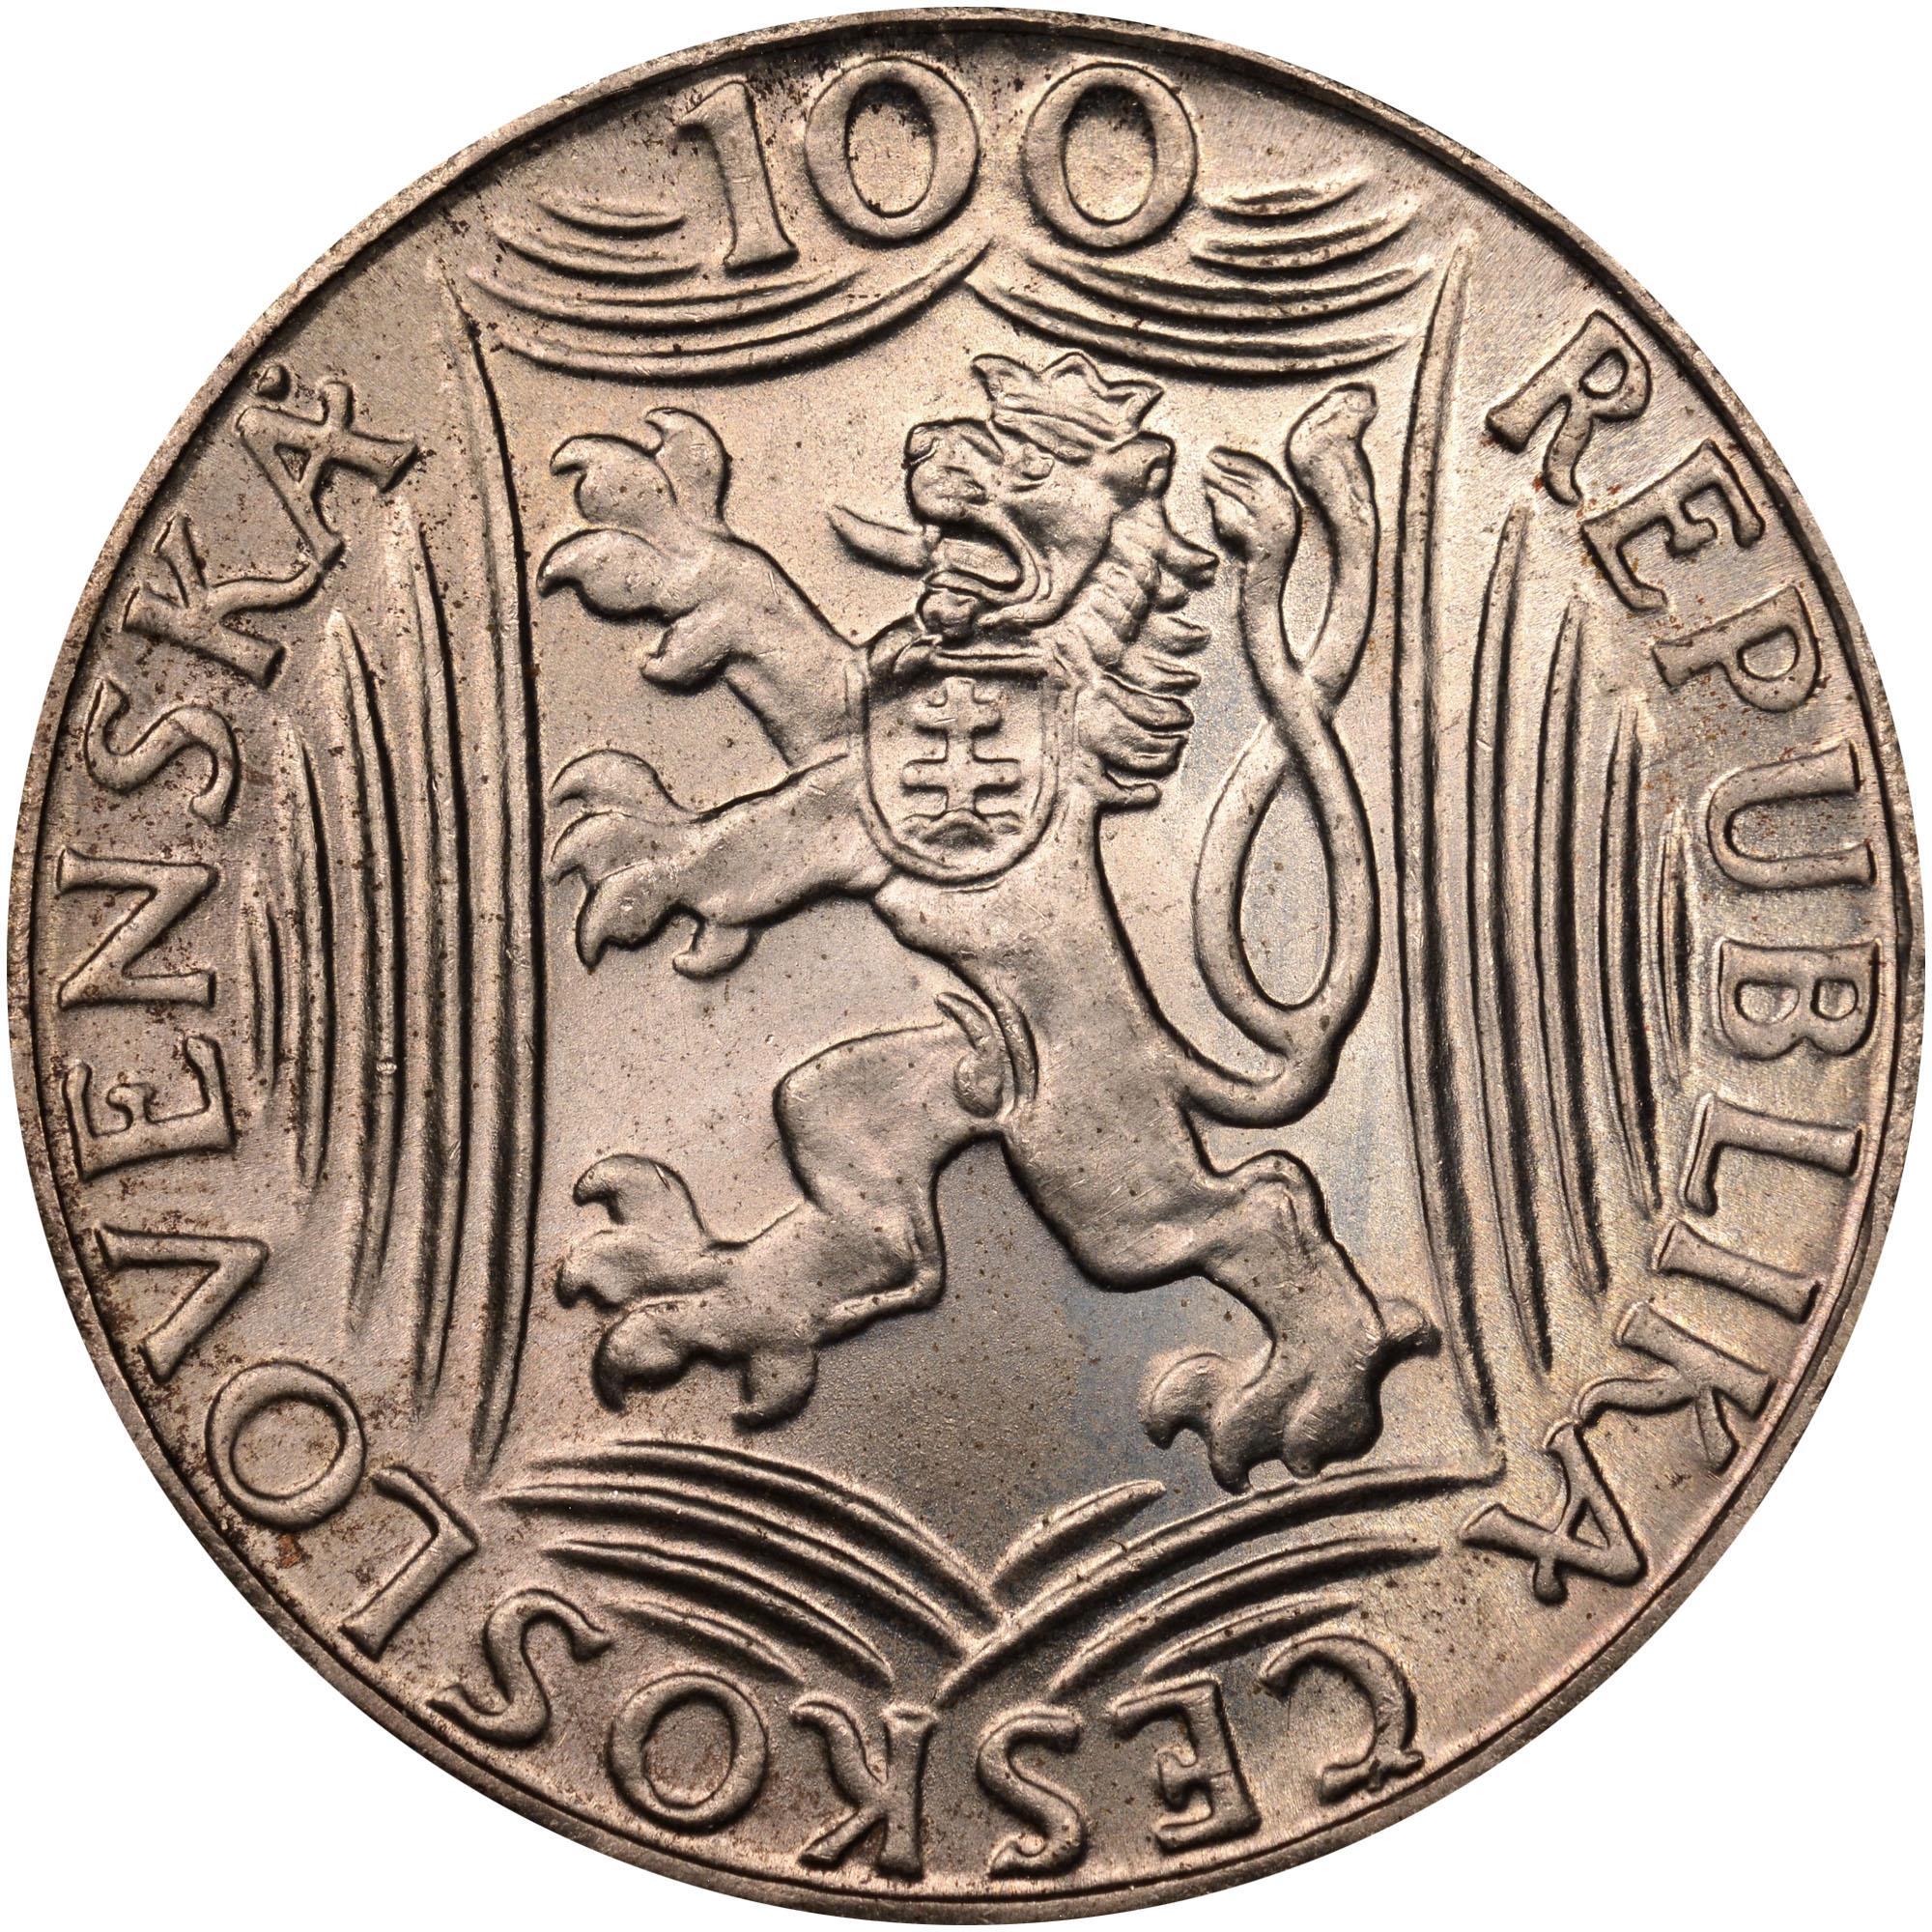 1949 Czechoslovakia 100 Korun obverse